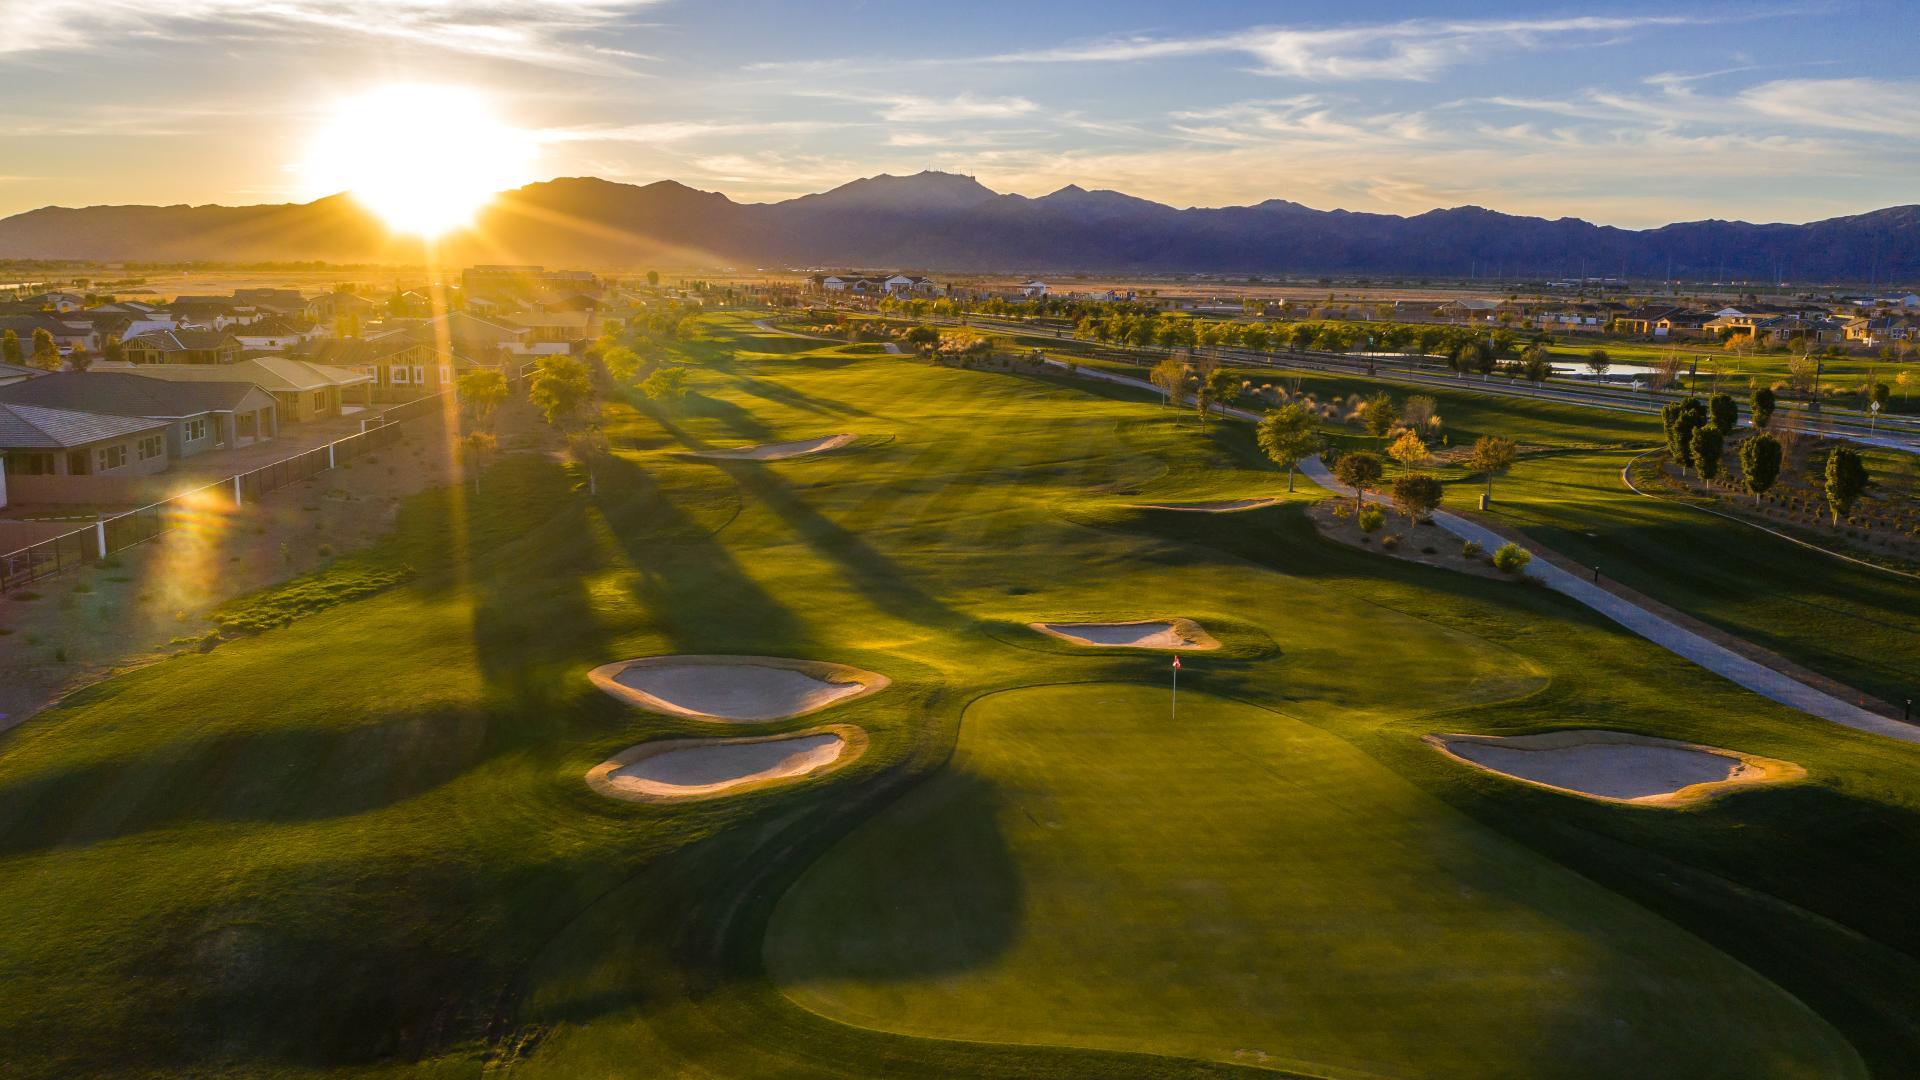 Enjoy beautiful golf course and mountain views